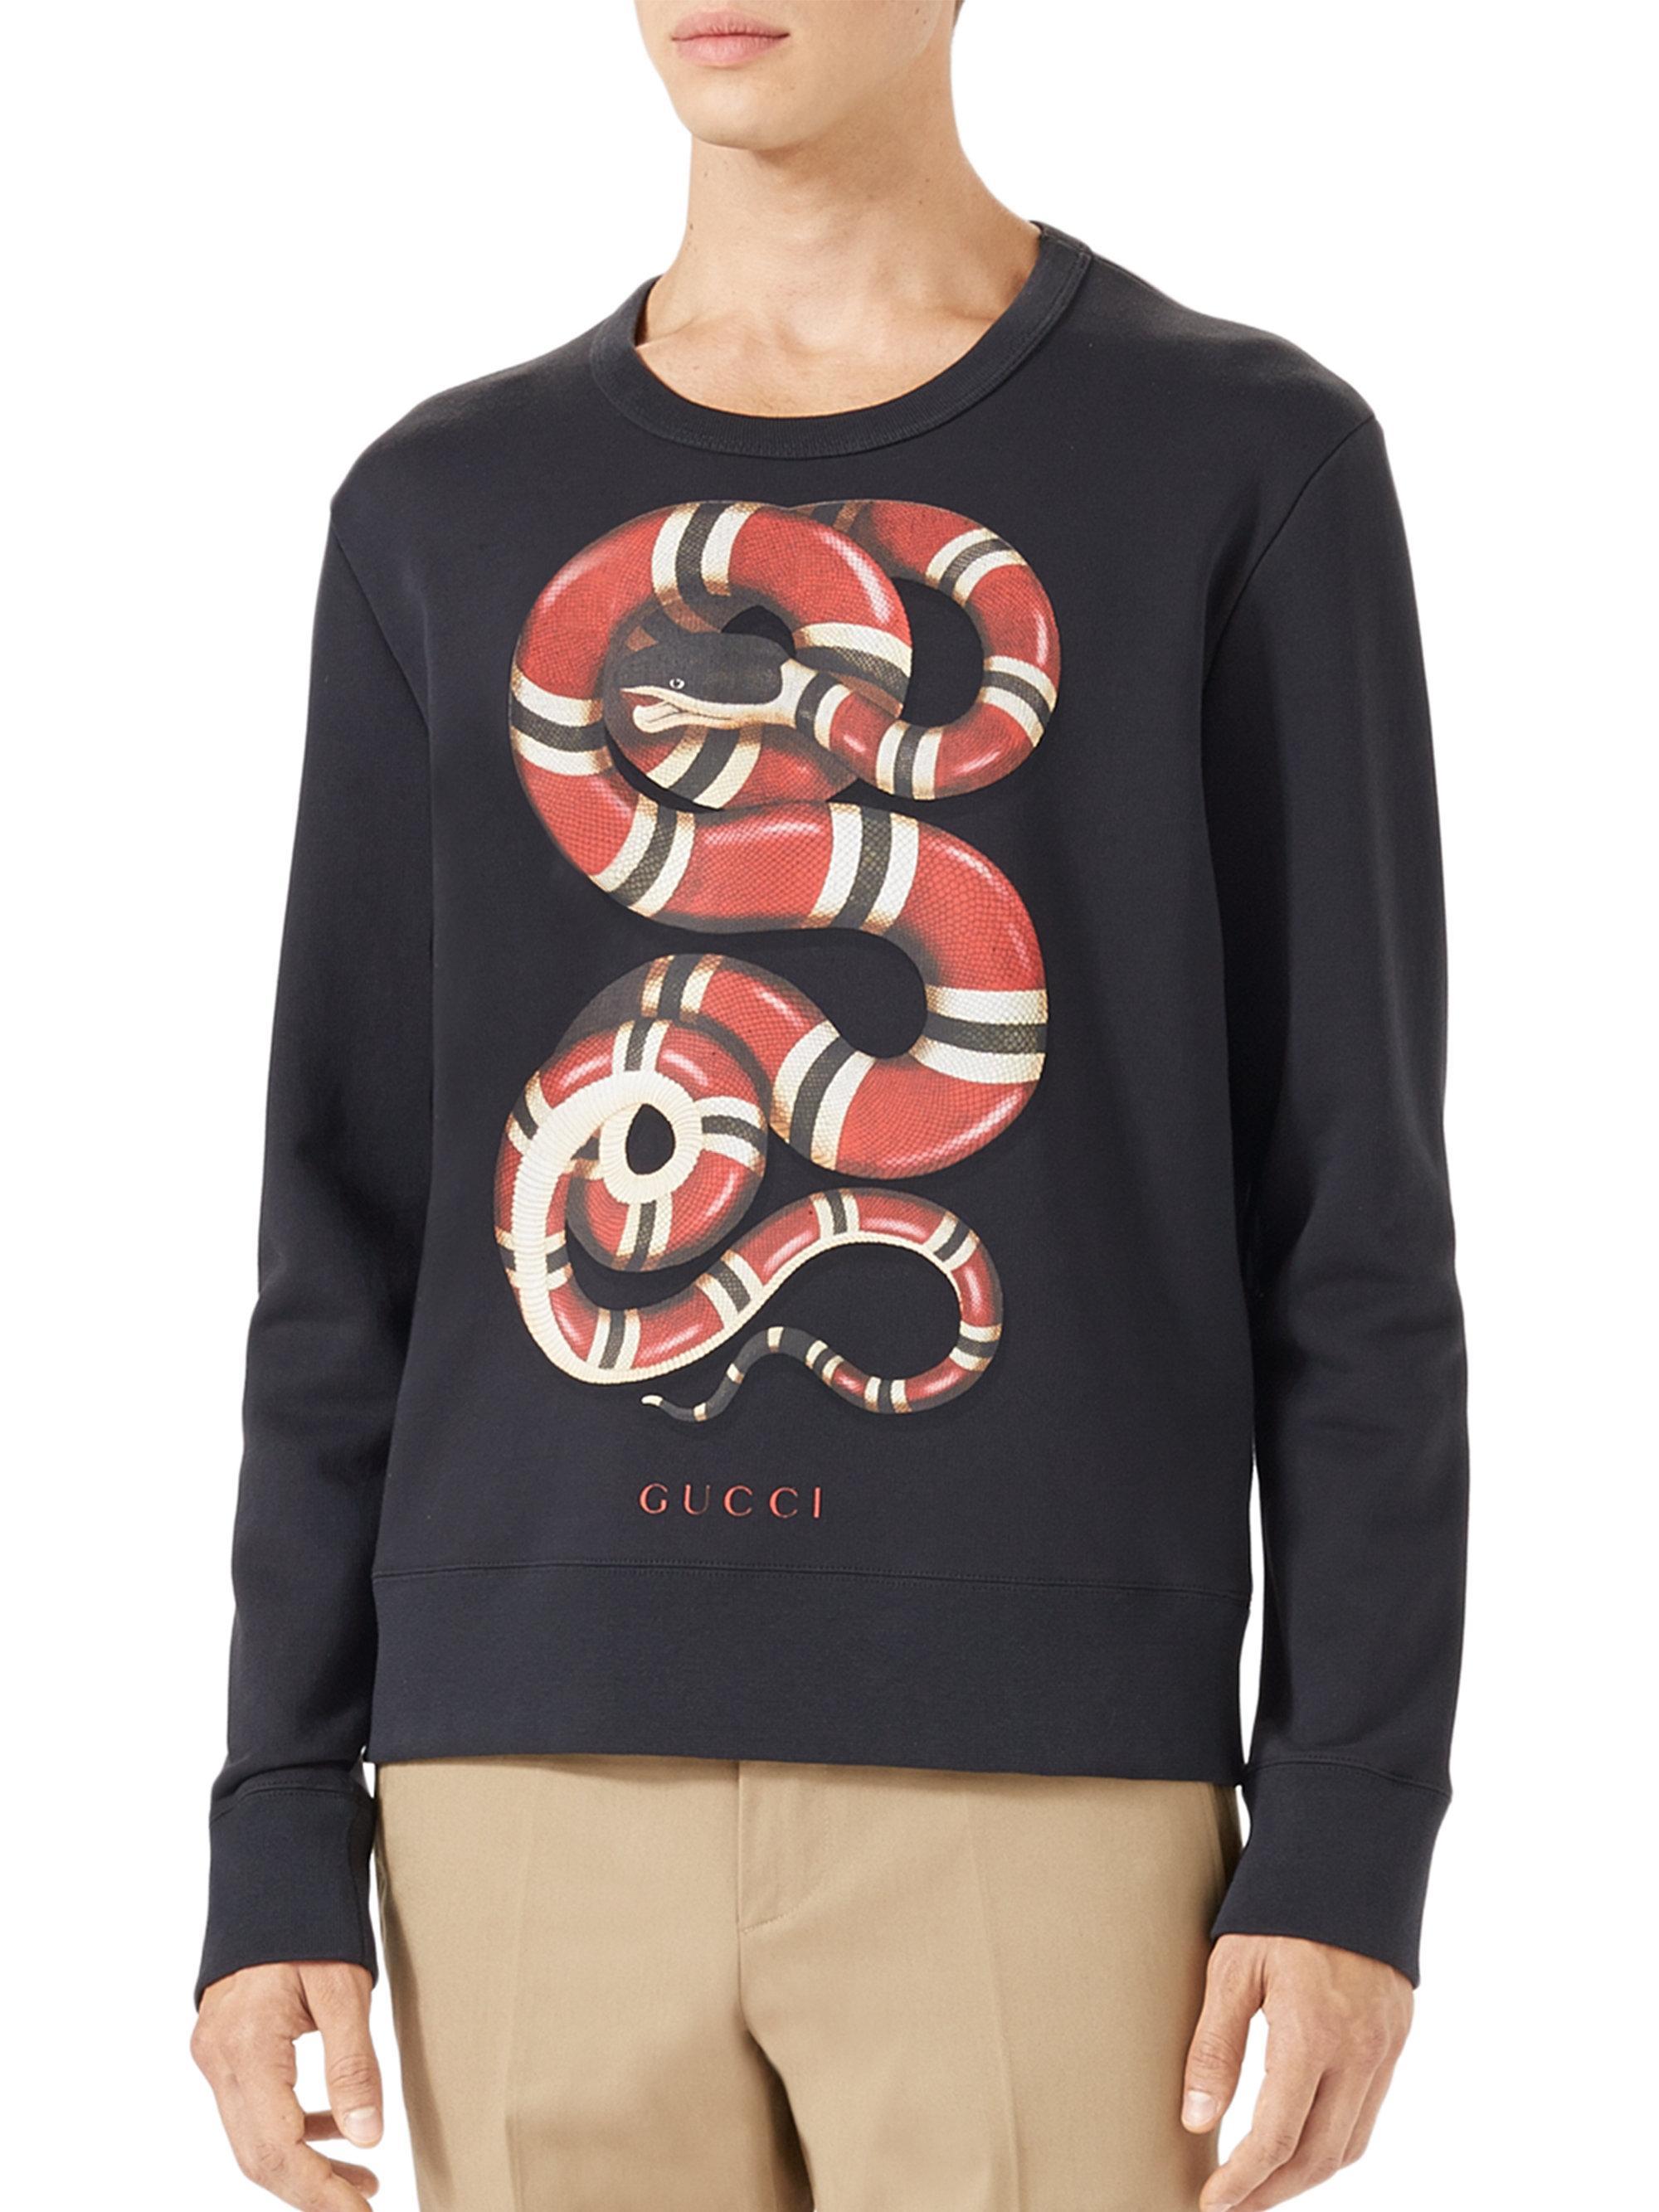 535a11d9aaf Lyst - Gucci Snake Print Cotton Sweatshirt in Black